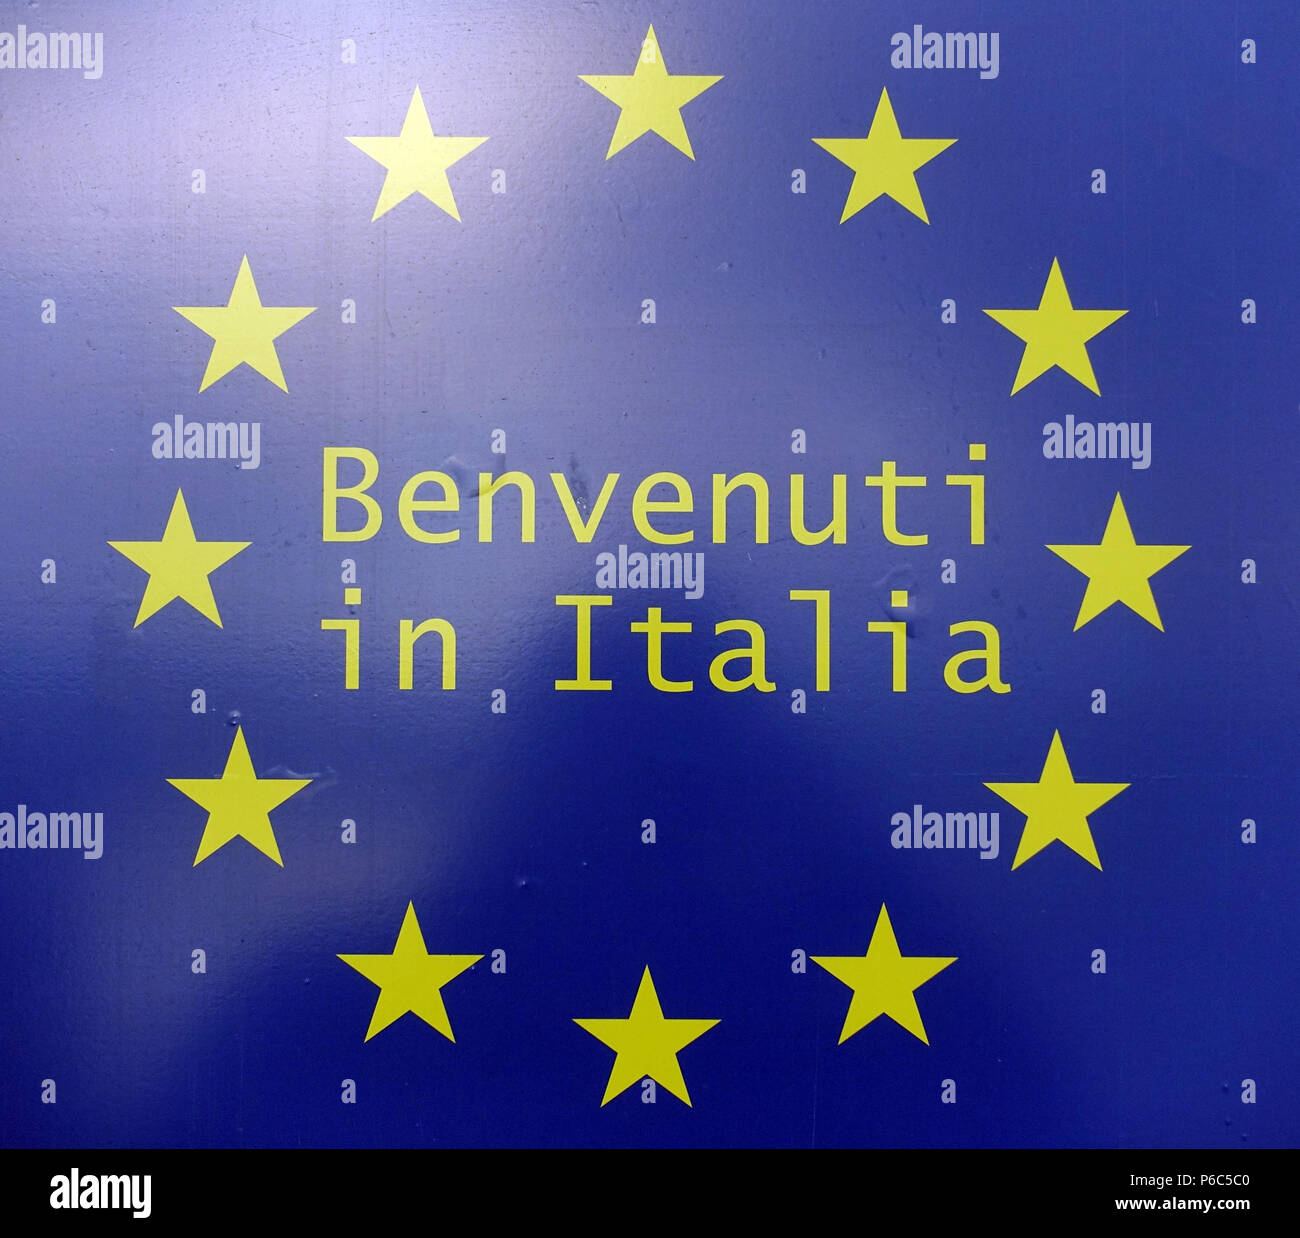 Ahlbeck, Germany - shield Benvenuti in Italia with the stars of the European Union - Stock Image